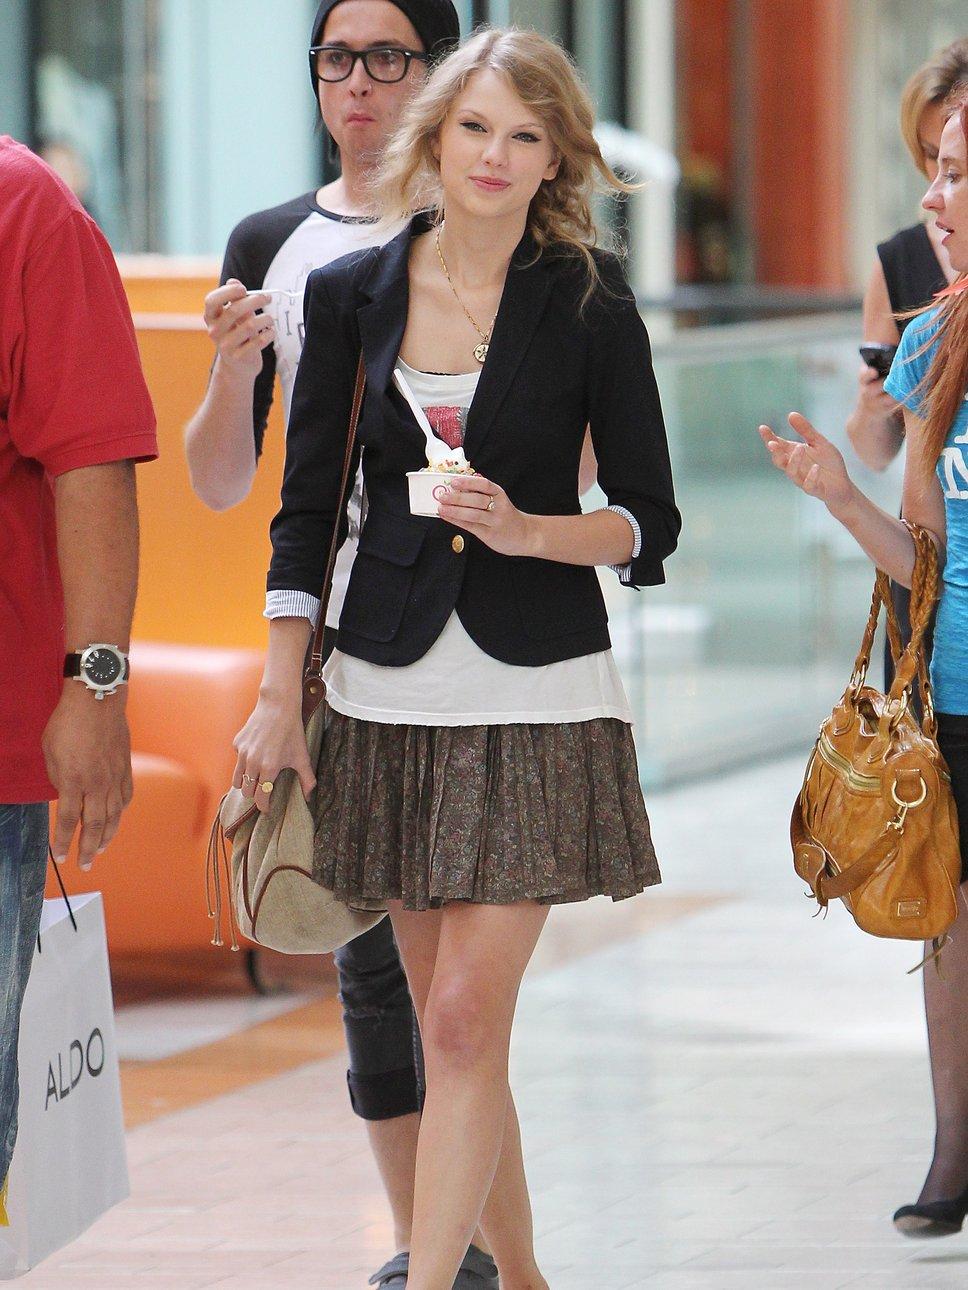 2012 Pleated Skirt - Taylor Swift